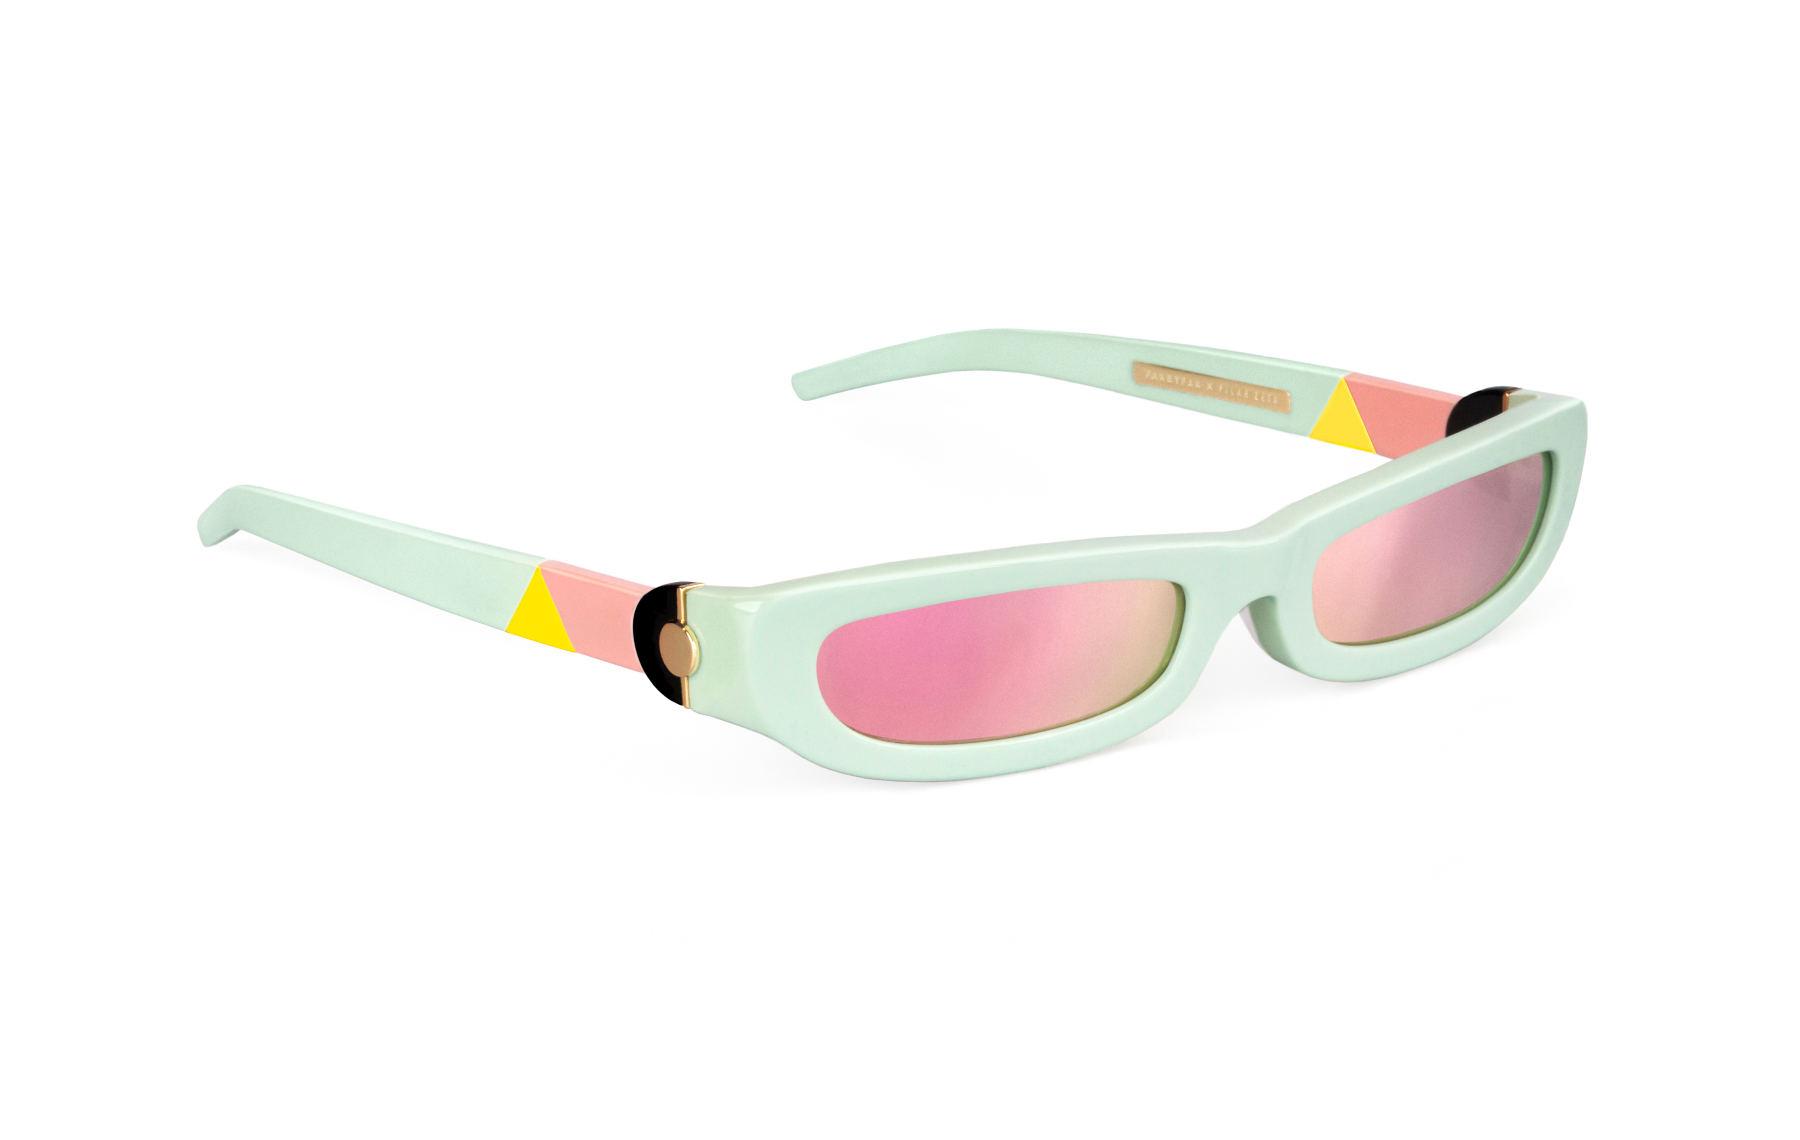 FAKBYFAK x Pilar Zeta  SHARP. Sunglasses. Glossy Mint & Mirrored Pink Code: FBF-14-01-04